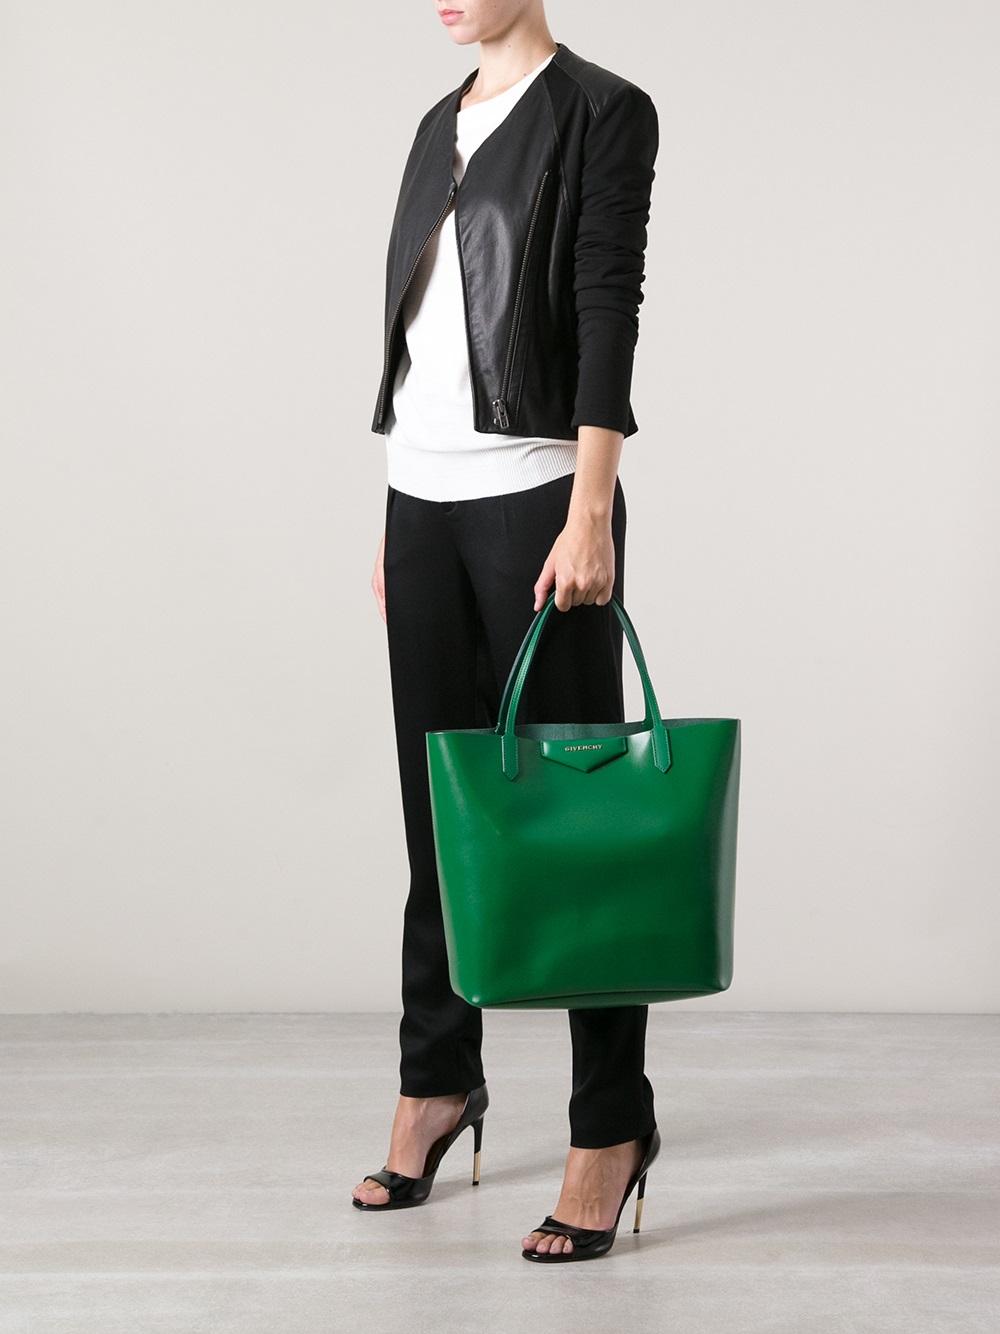 Lyst - Givenchy Antigona Large Shopping Tote in Green b8cf90123f